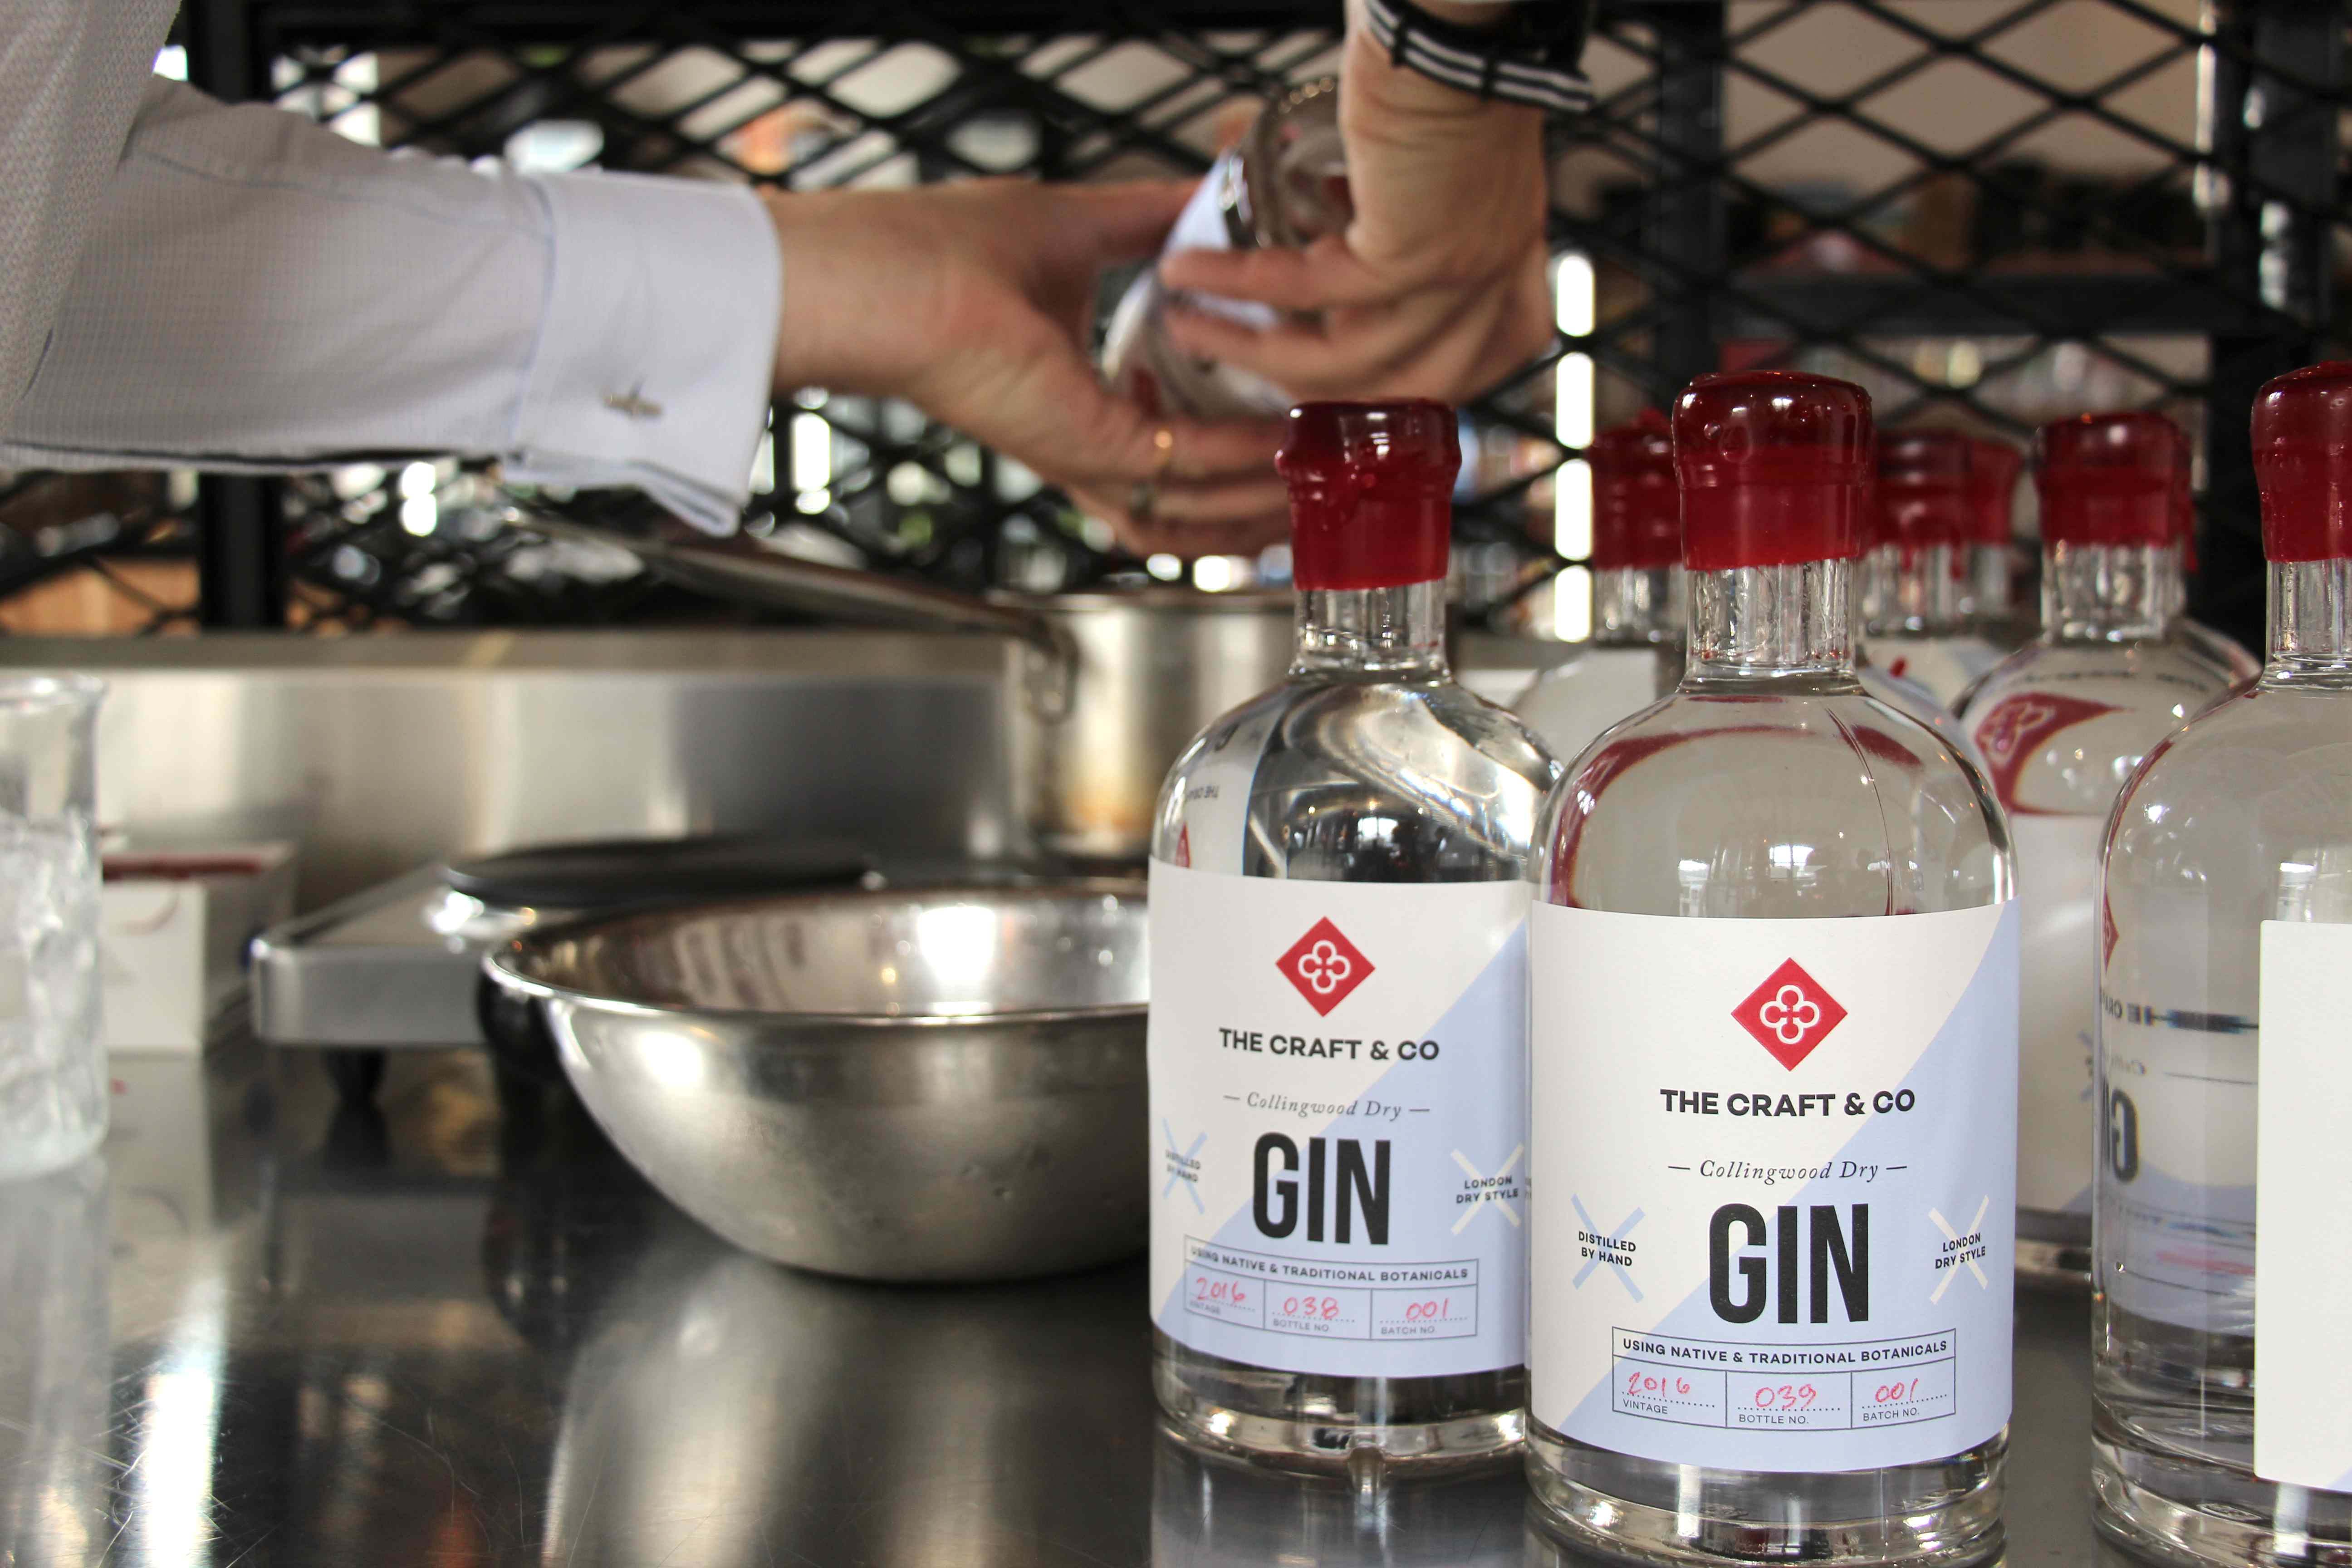 waxed_gin_bottles